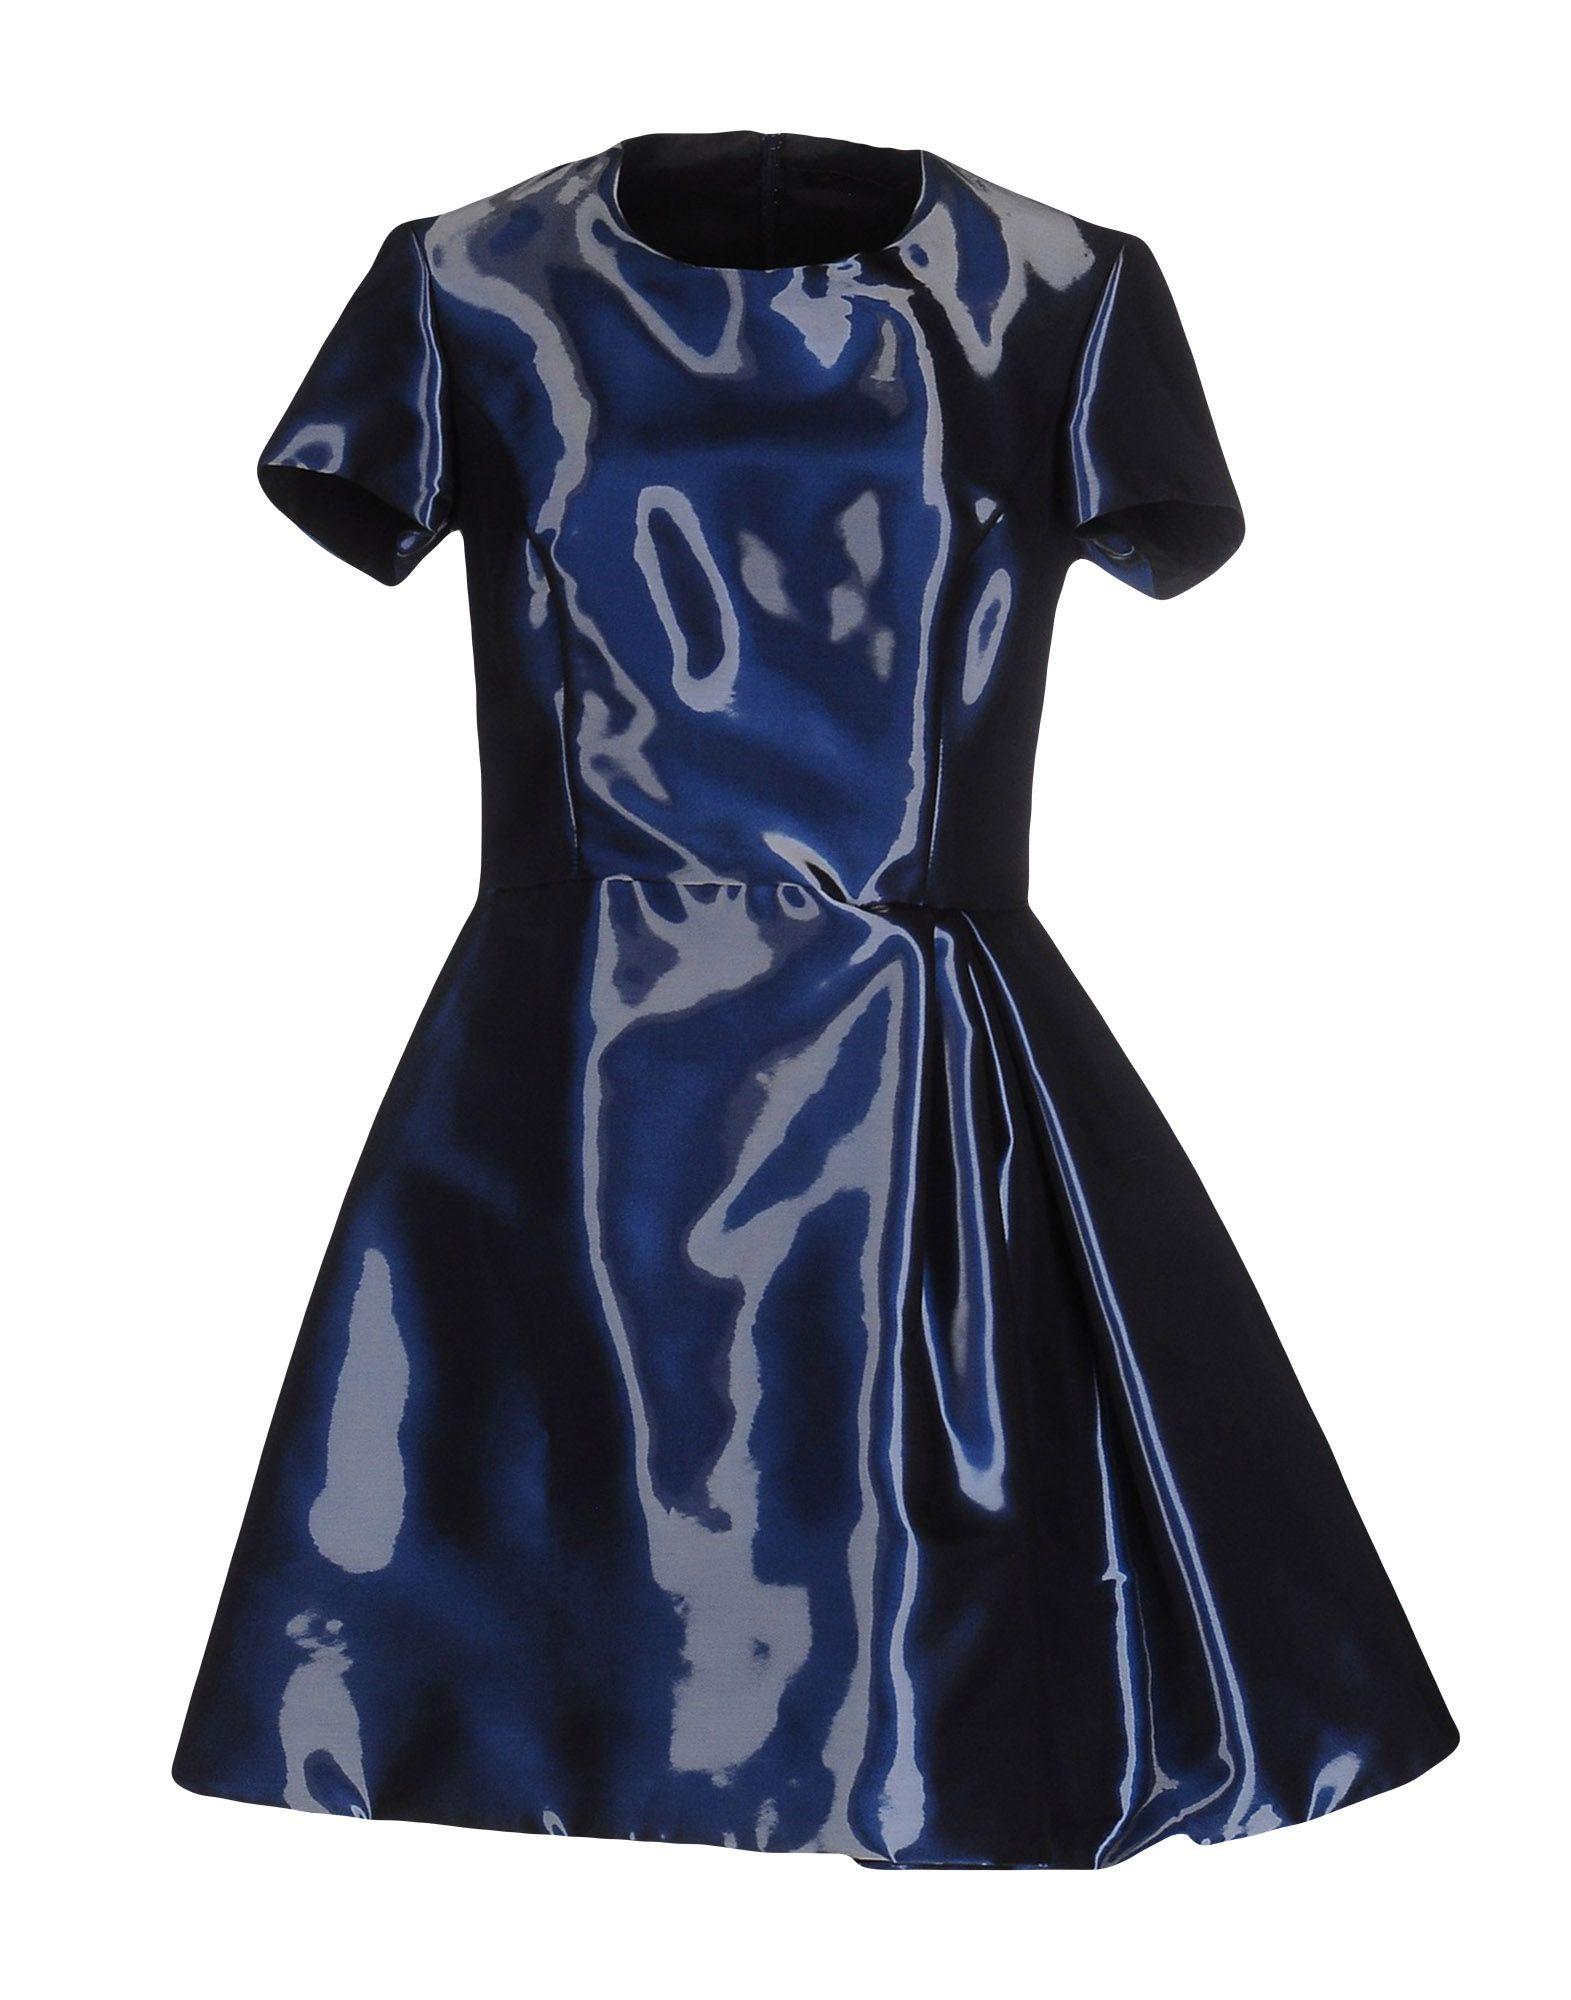 IO COUTURE Короткое платье ene io kb926qf co kb926qf b1